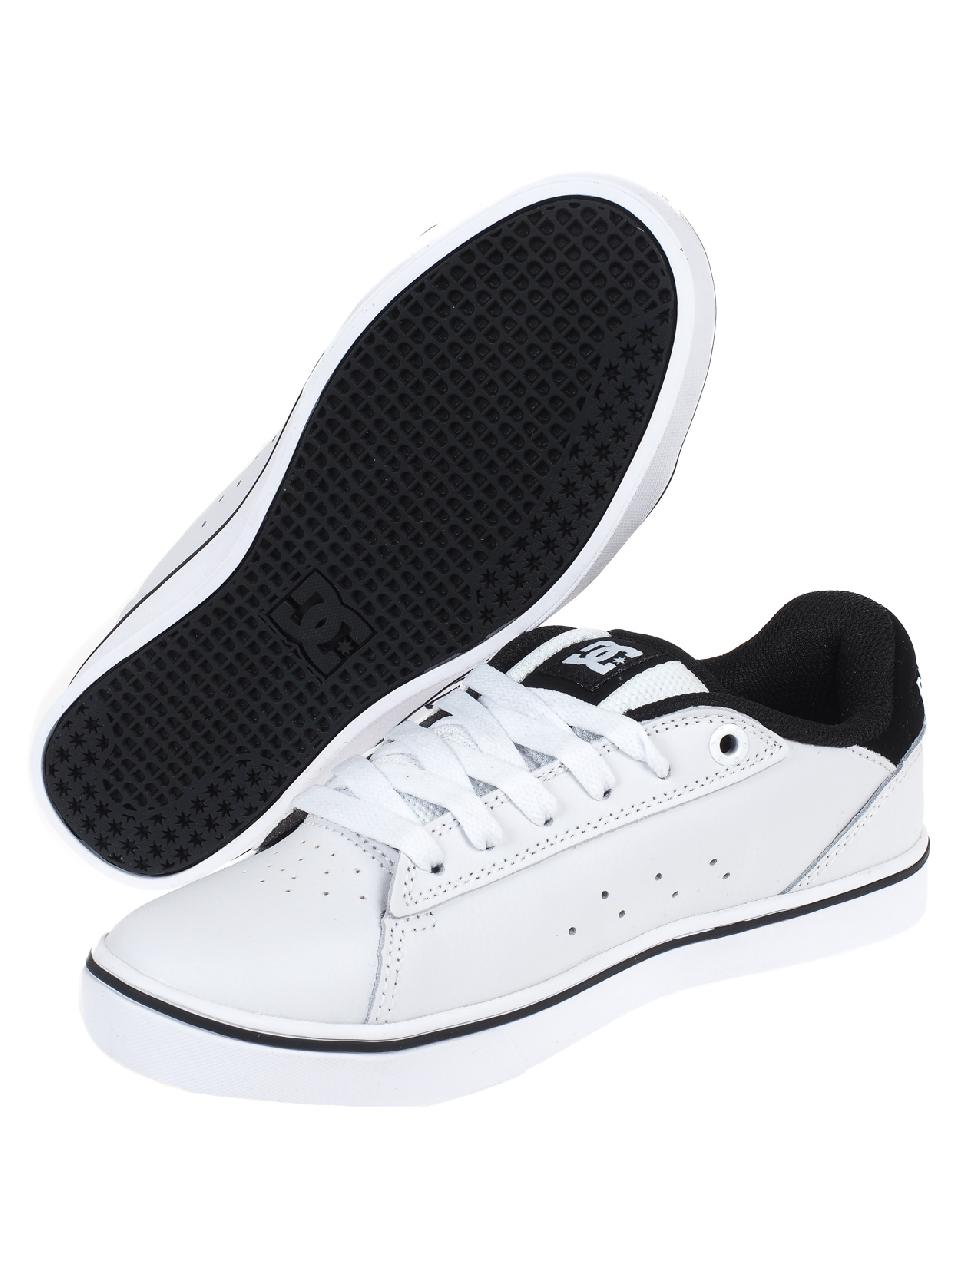 Chaussures-skateboard-Dc-shoes-Notch-jr-white-Blanc-78830-Neuf